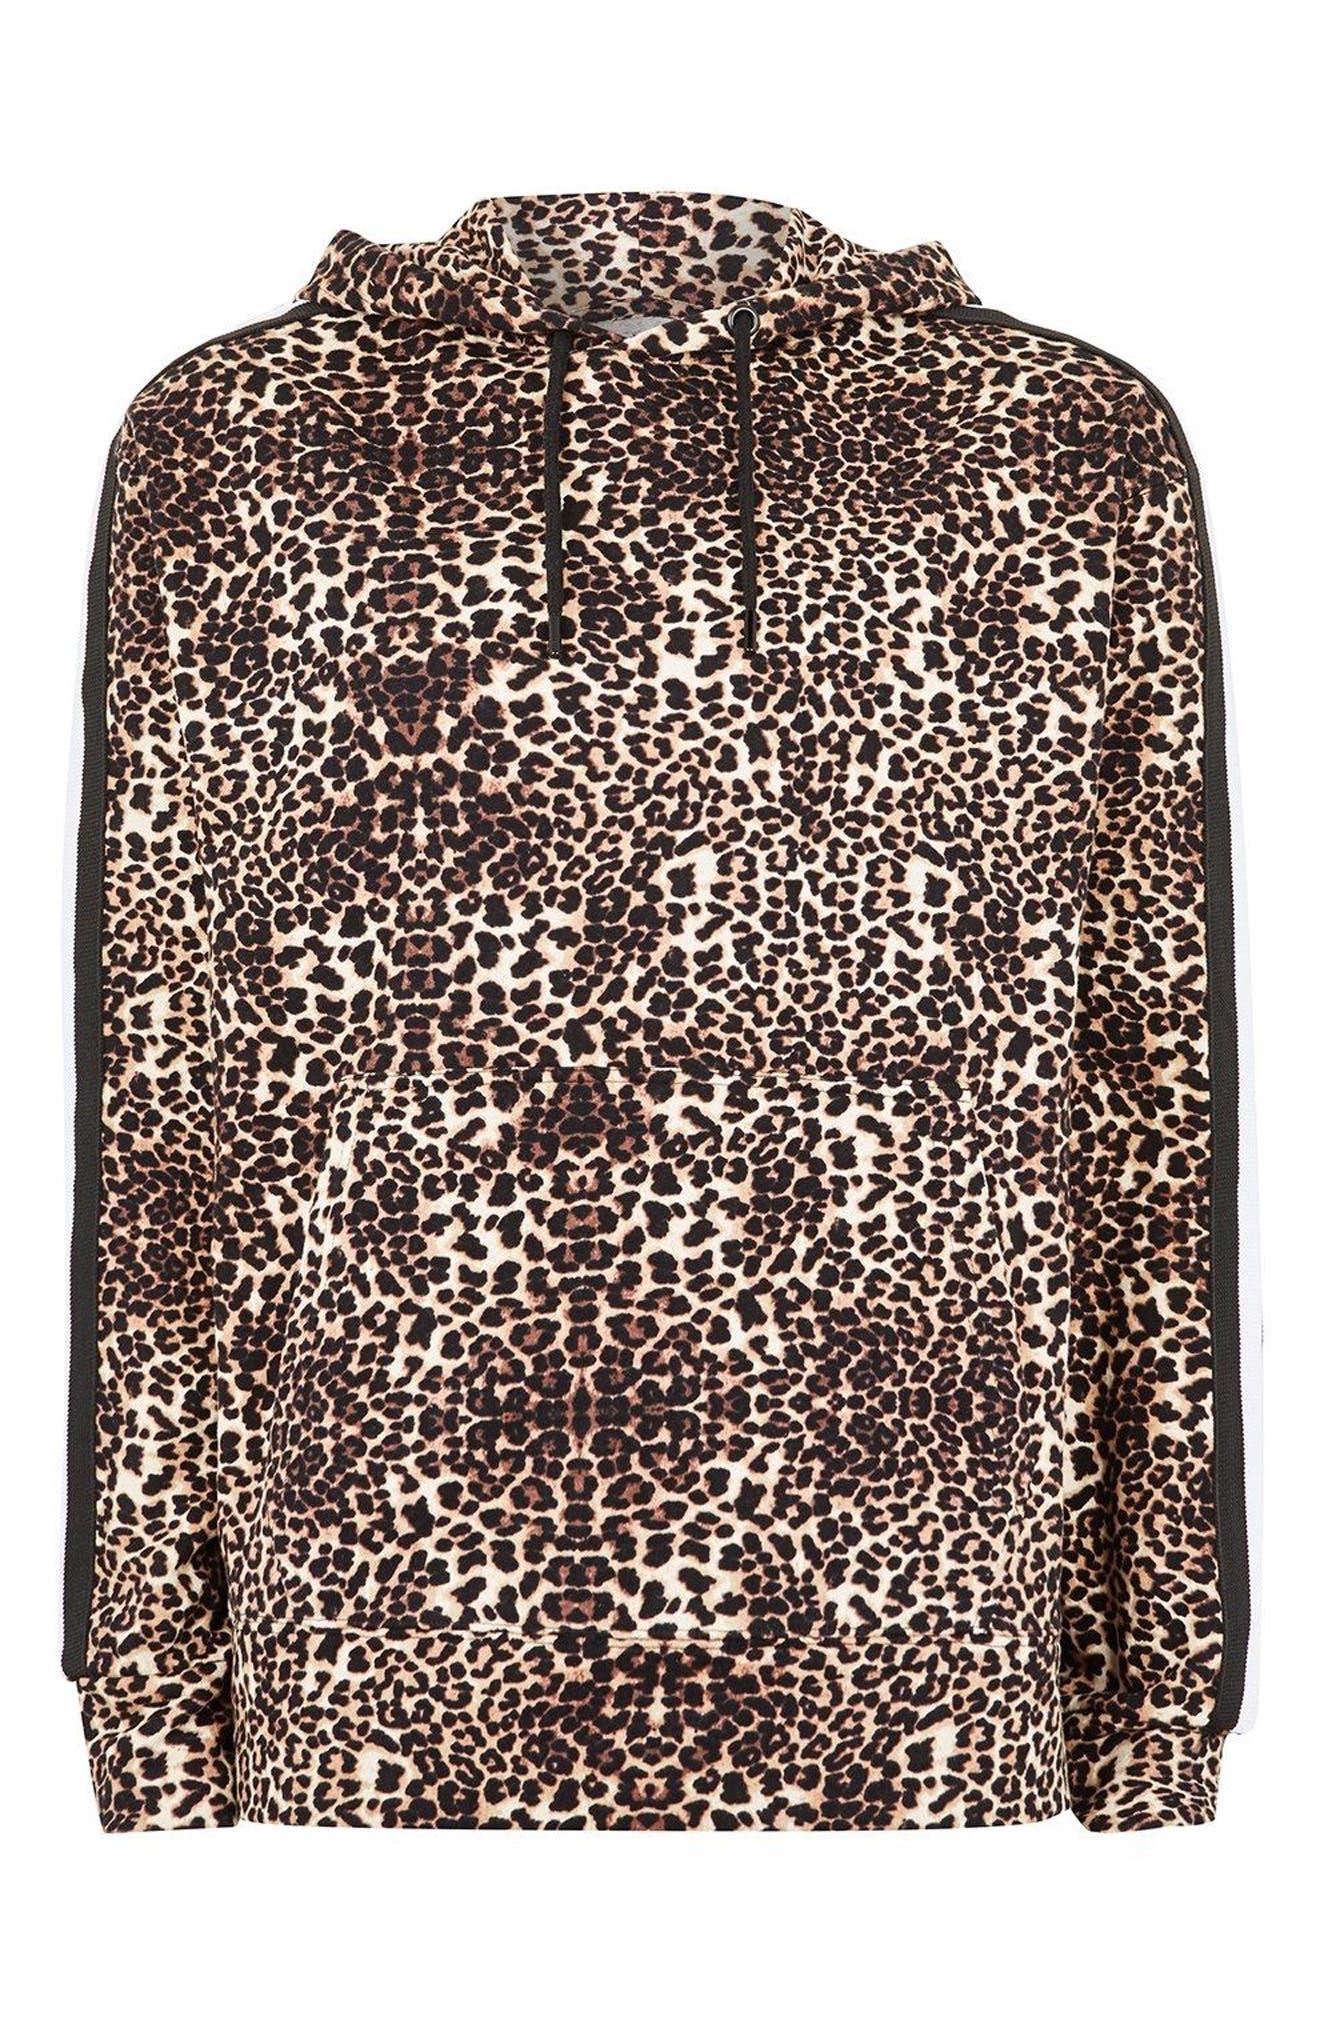 Leopard Print Hoodie,                         Main,                         color,